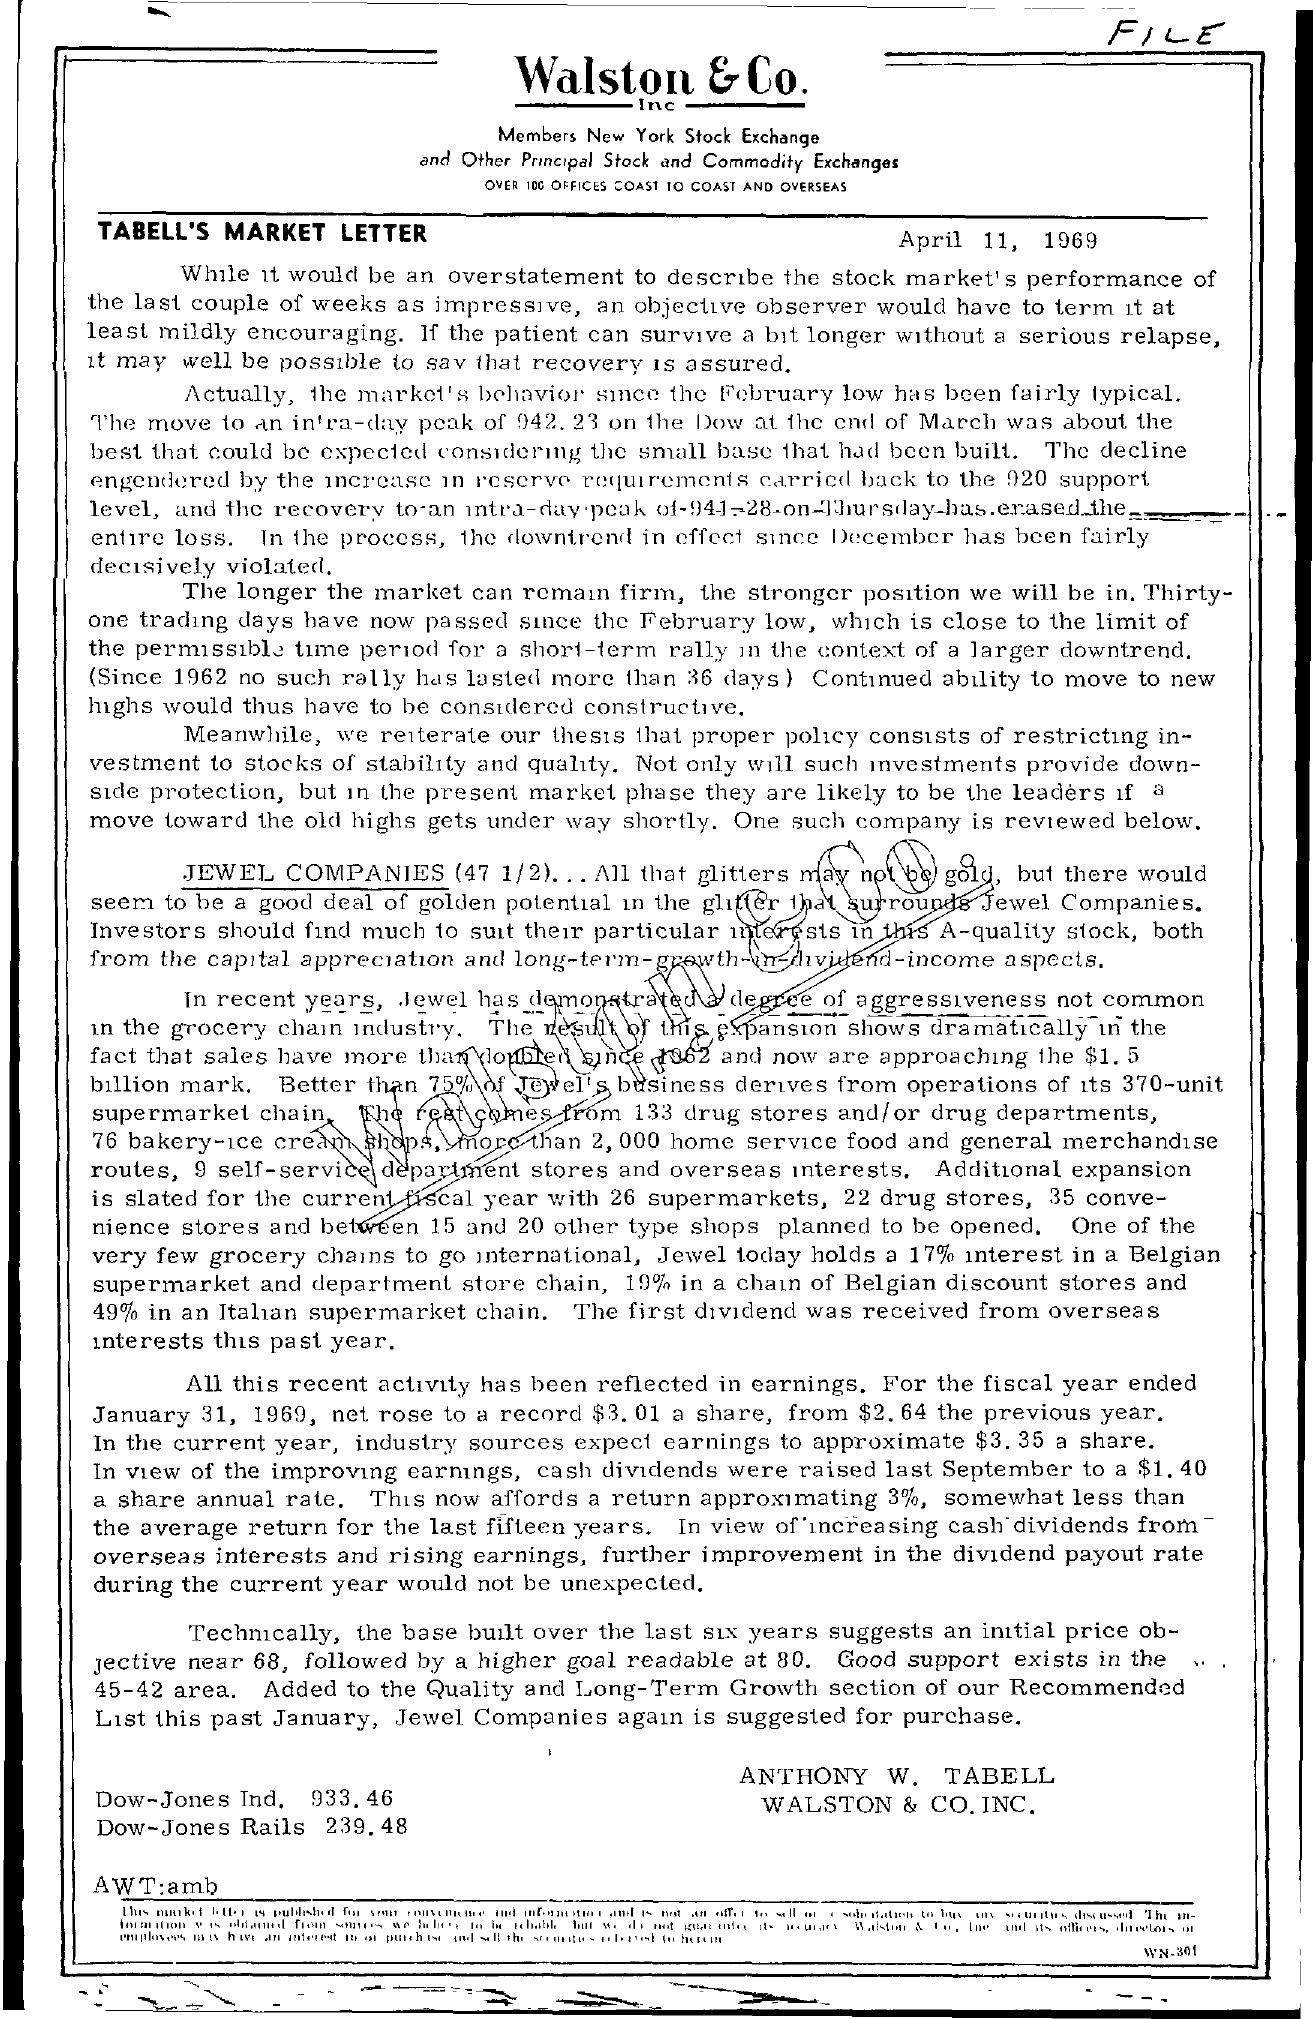 Tabell's Market Letter - April 11, 1969